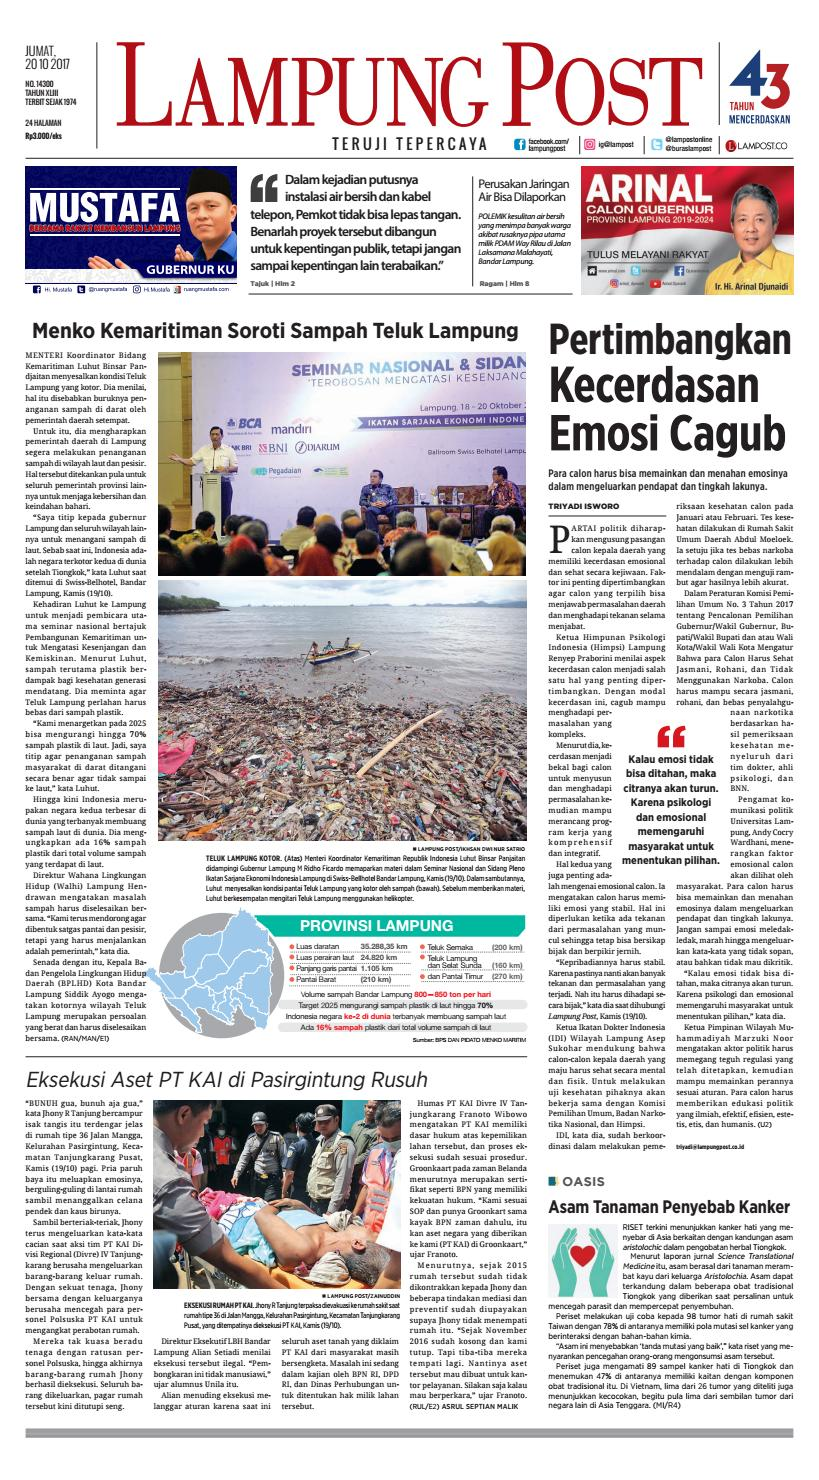 Lampung Post Jumat 20 Oktober 2017 By Issuu Produk Ukm Bumn Sulam Usus Pmk